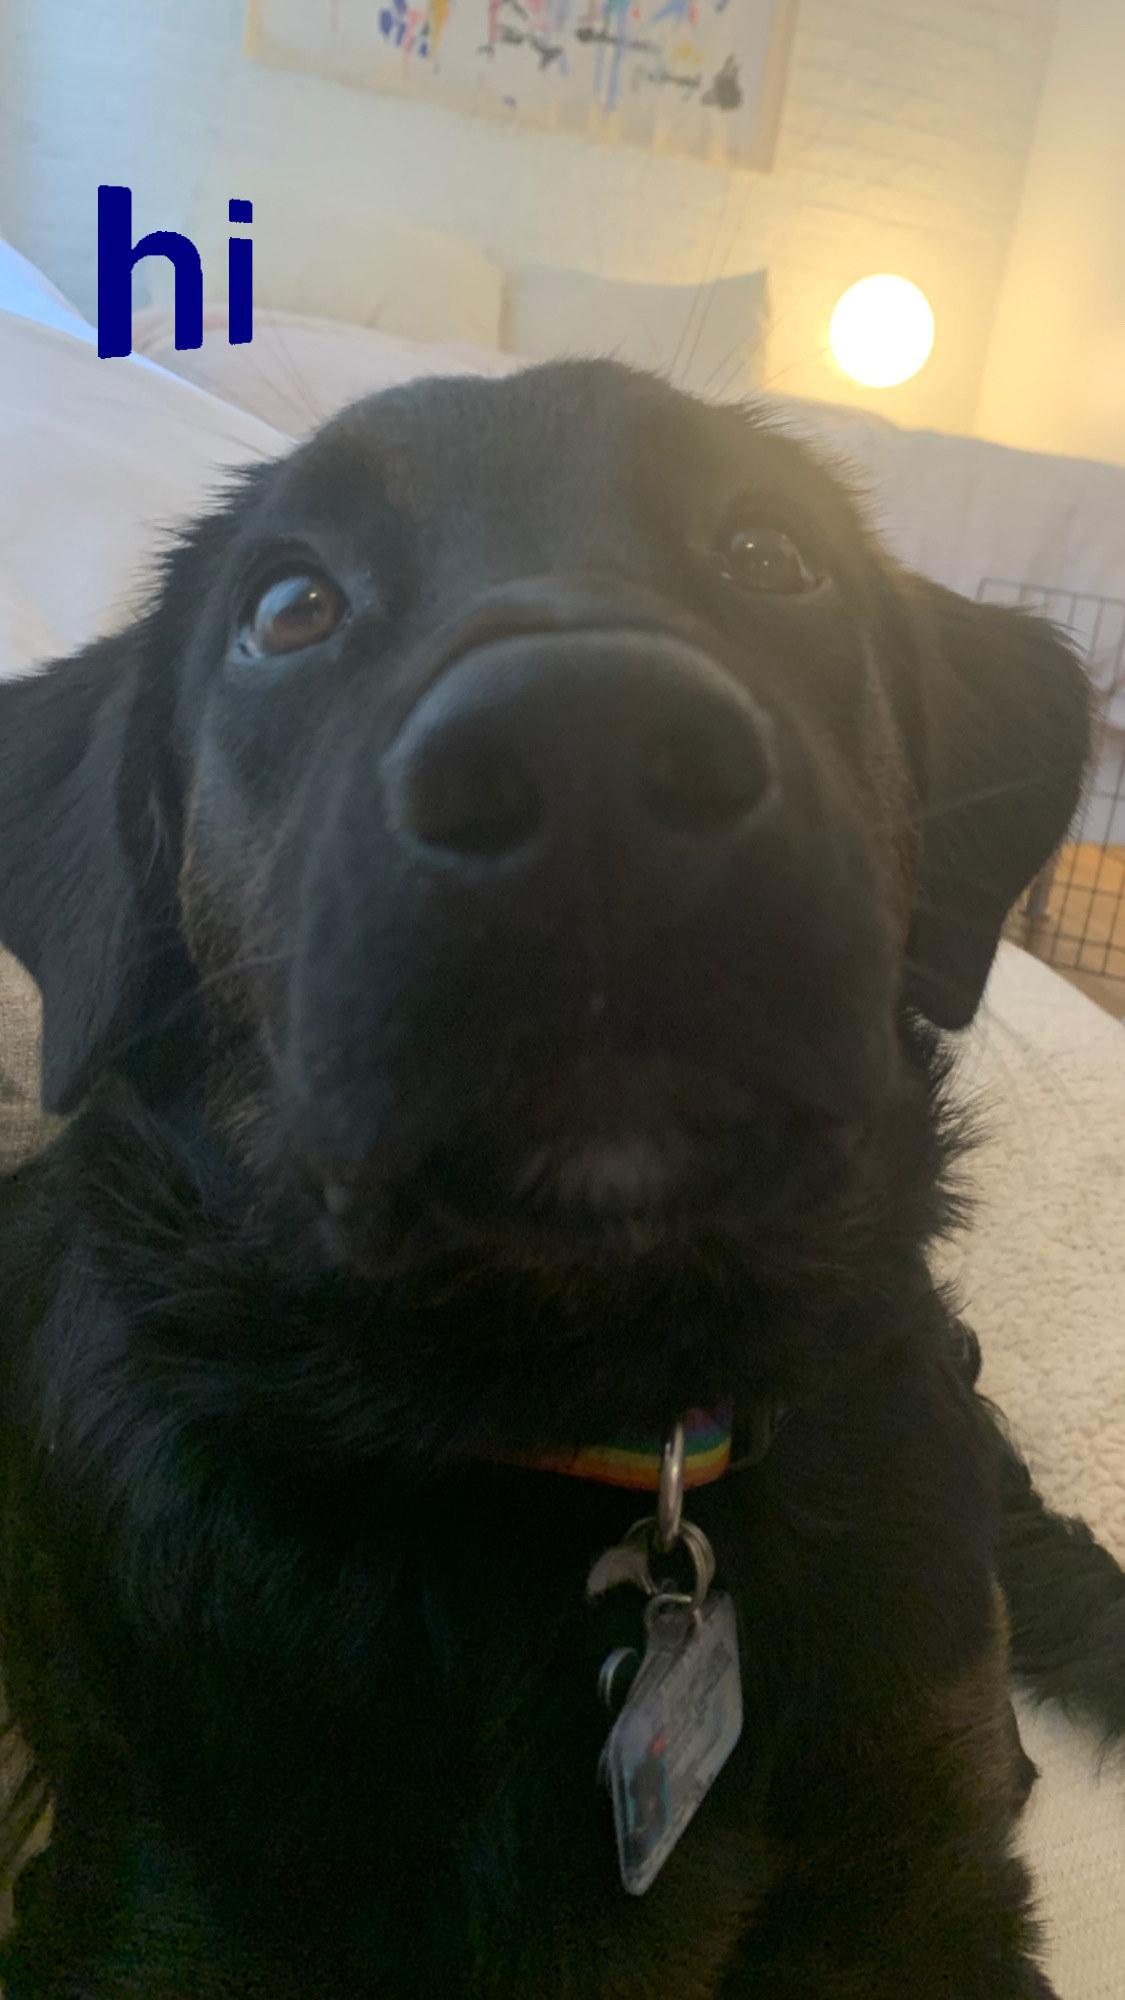 Close up of the pup saying hi